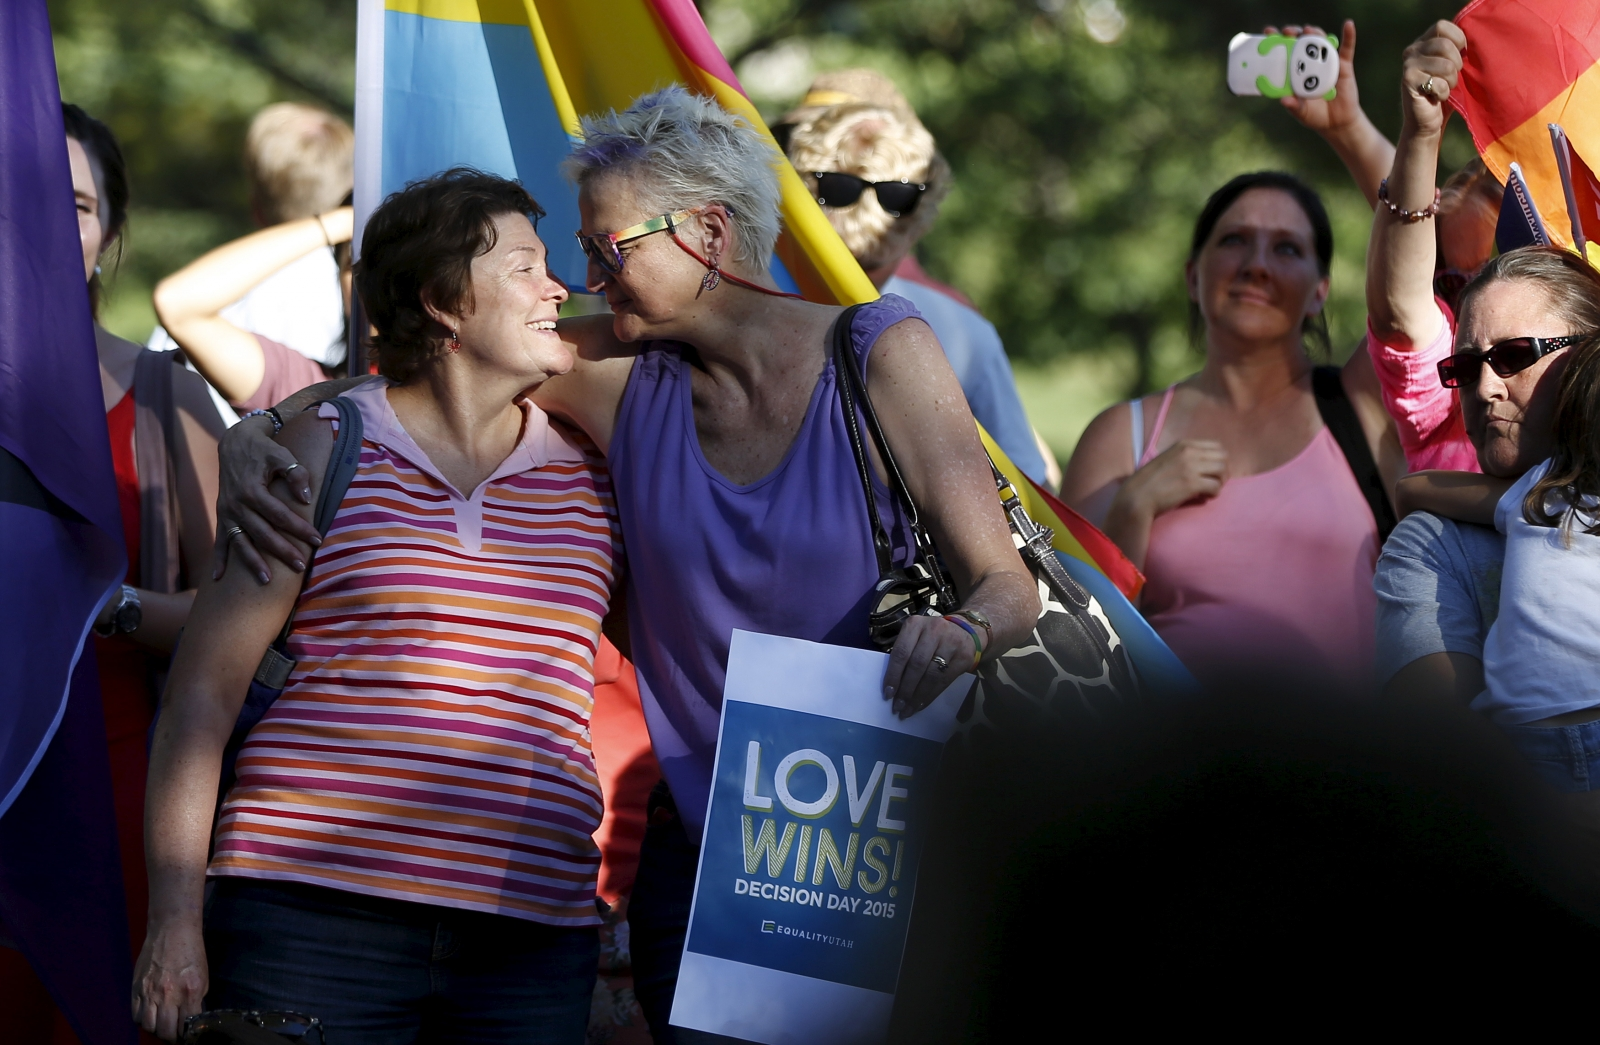 community center Hartford gay lesbian